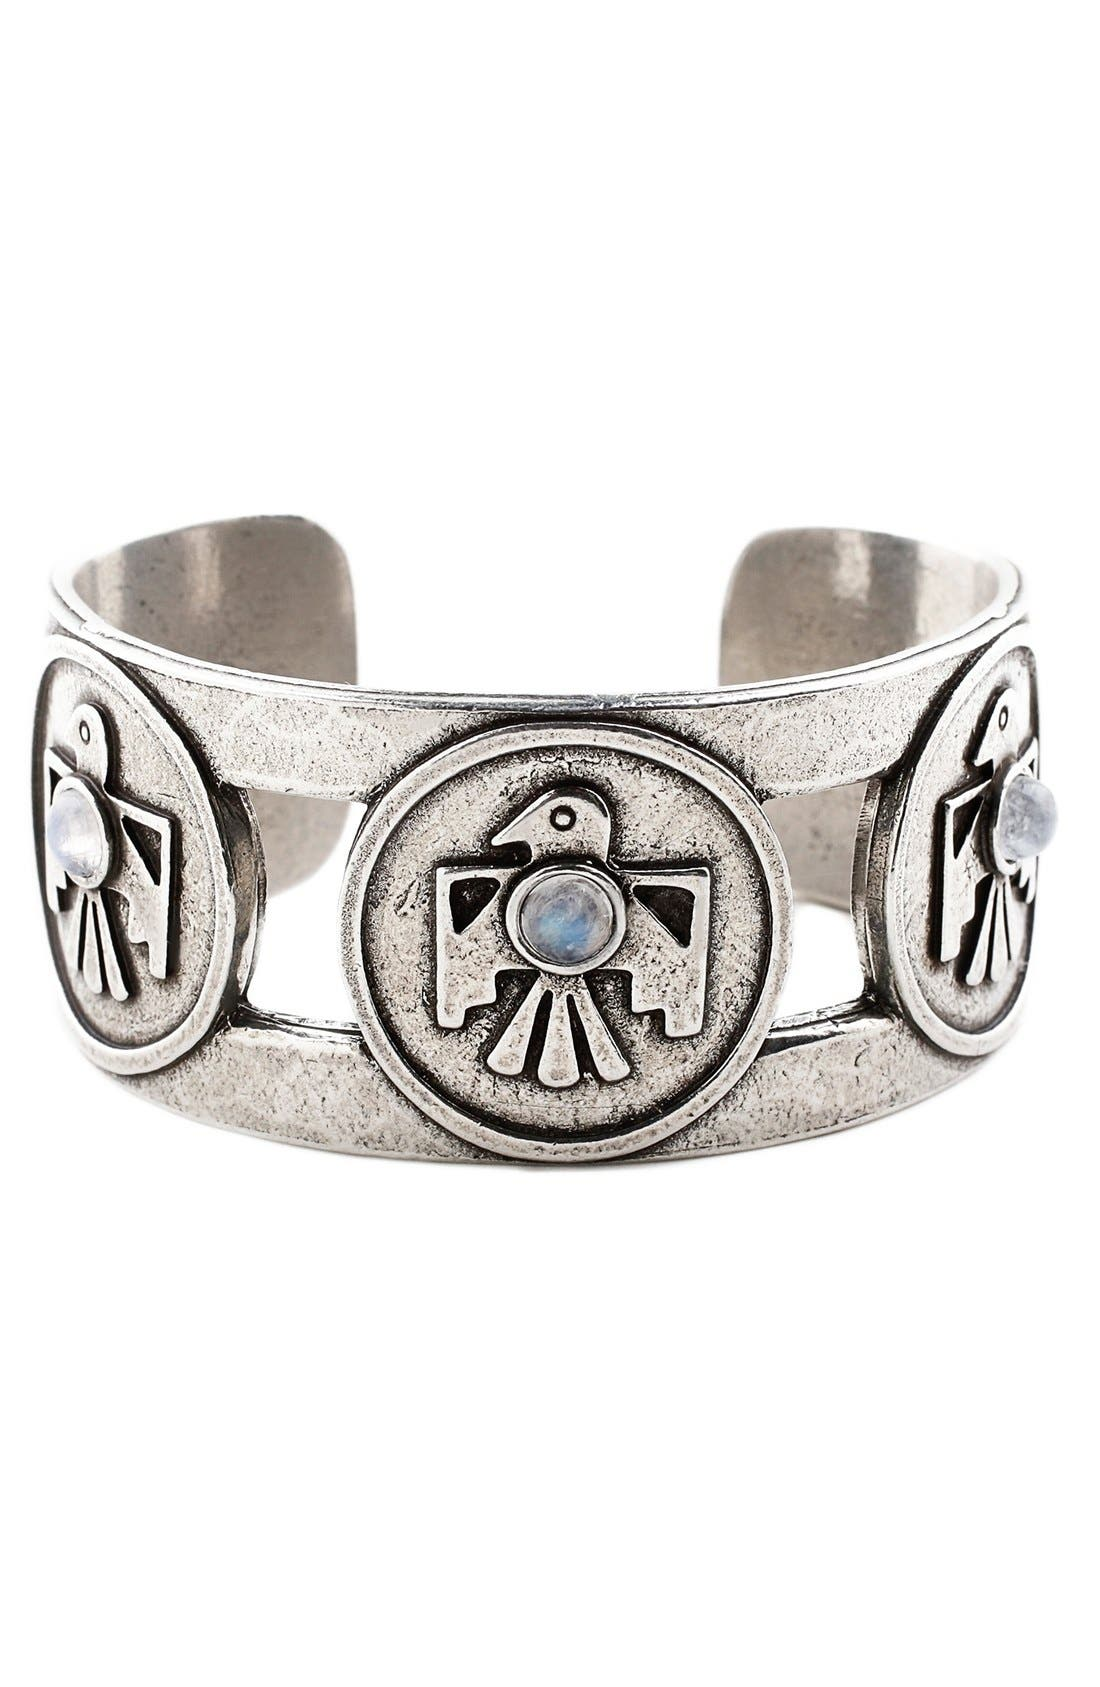 Main Image - The 2BANDITS 'Porter's Thunderbird' Cuff Bracelet